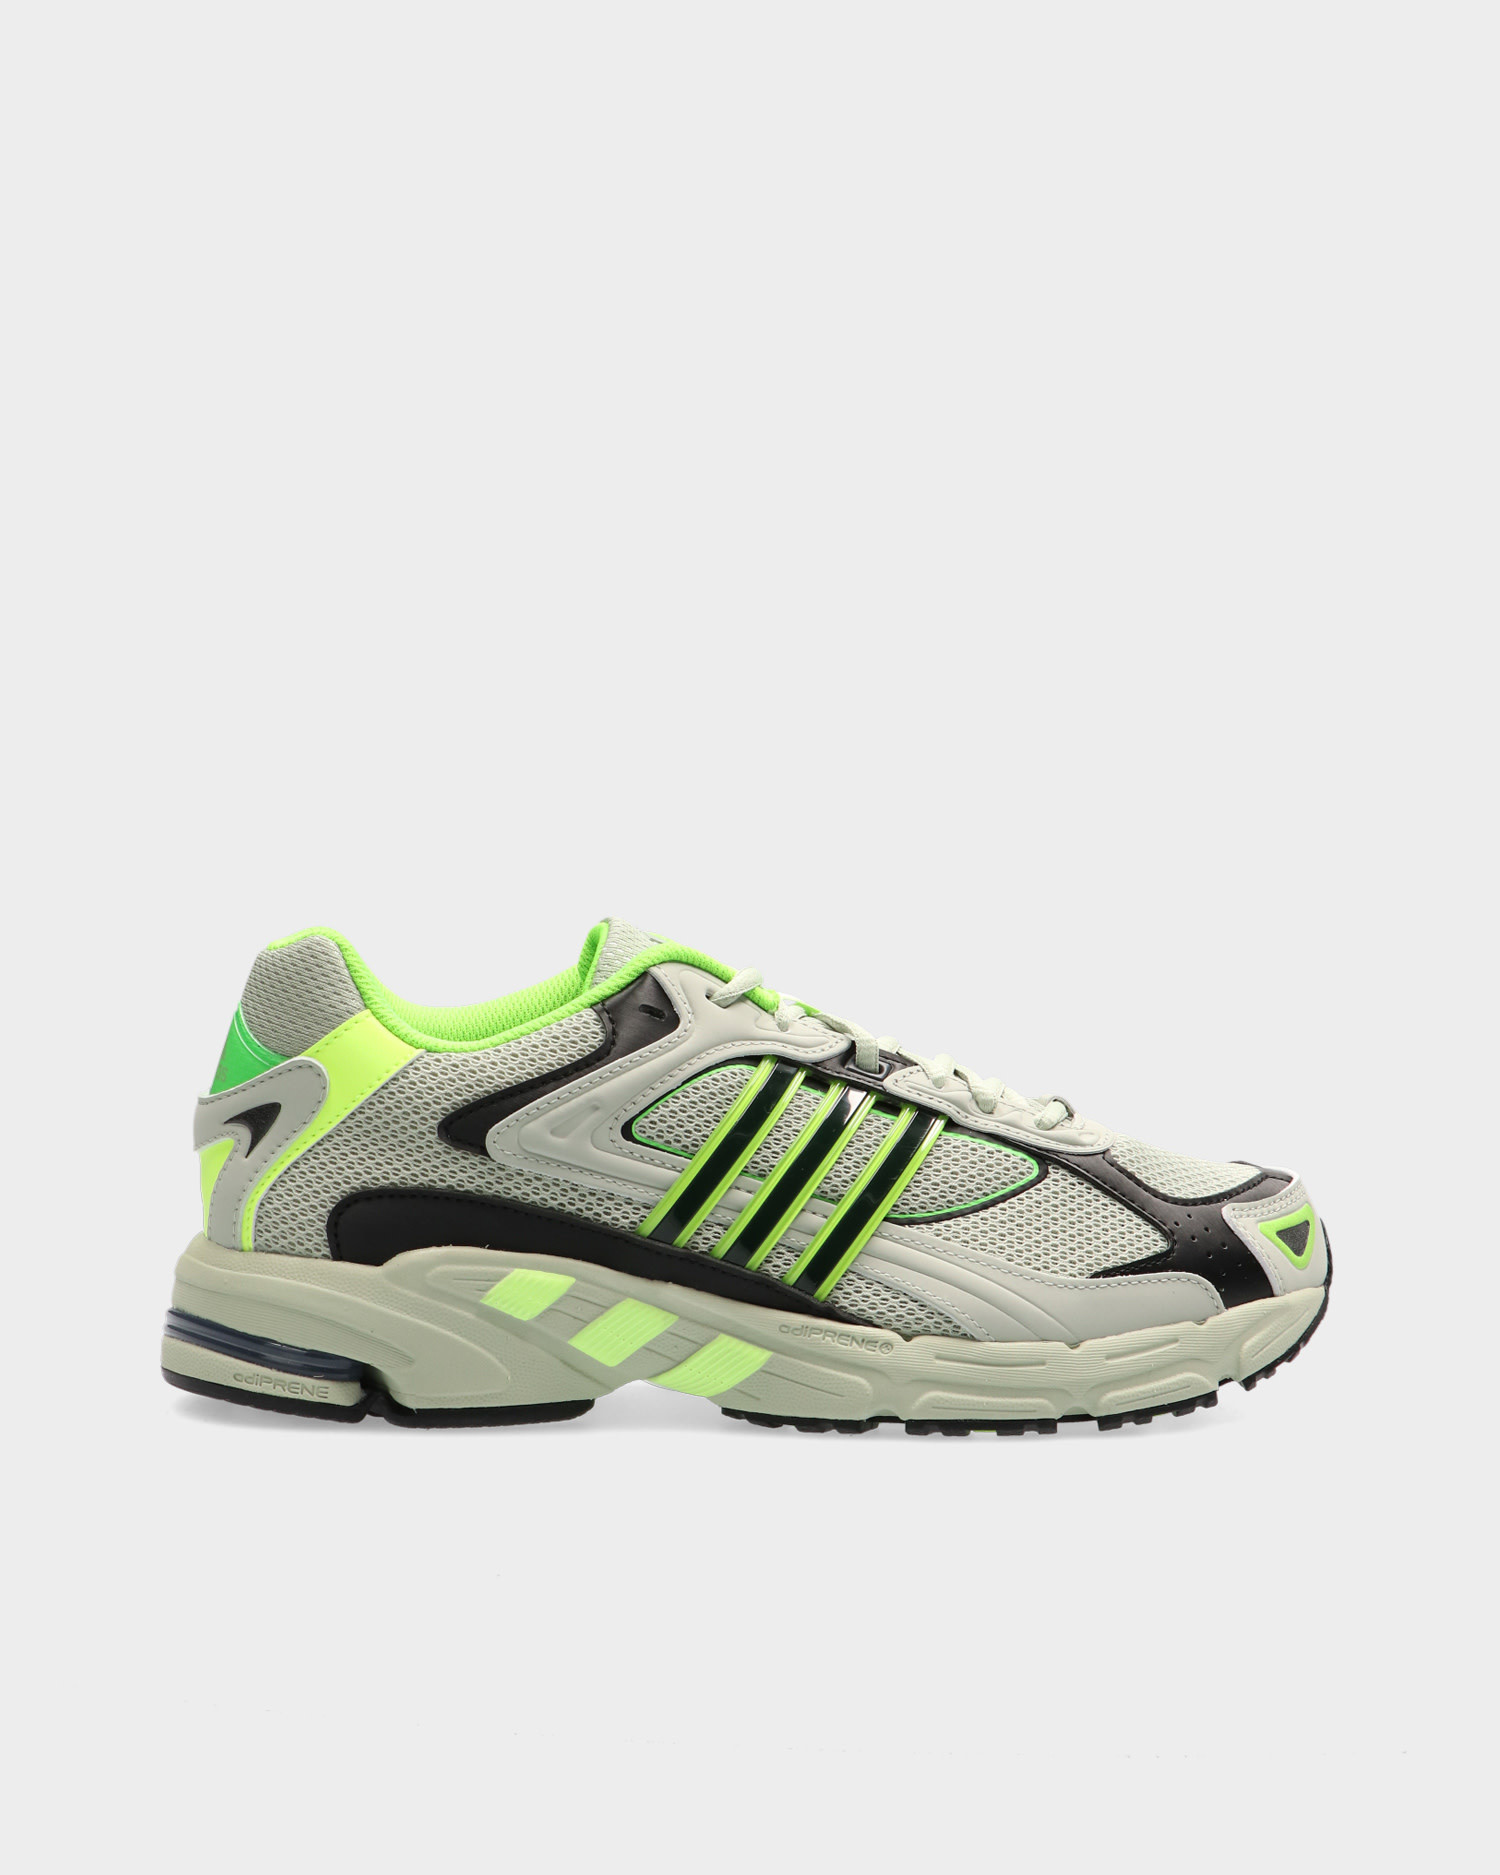 Adidas Response CL Halgrn/Cblack